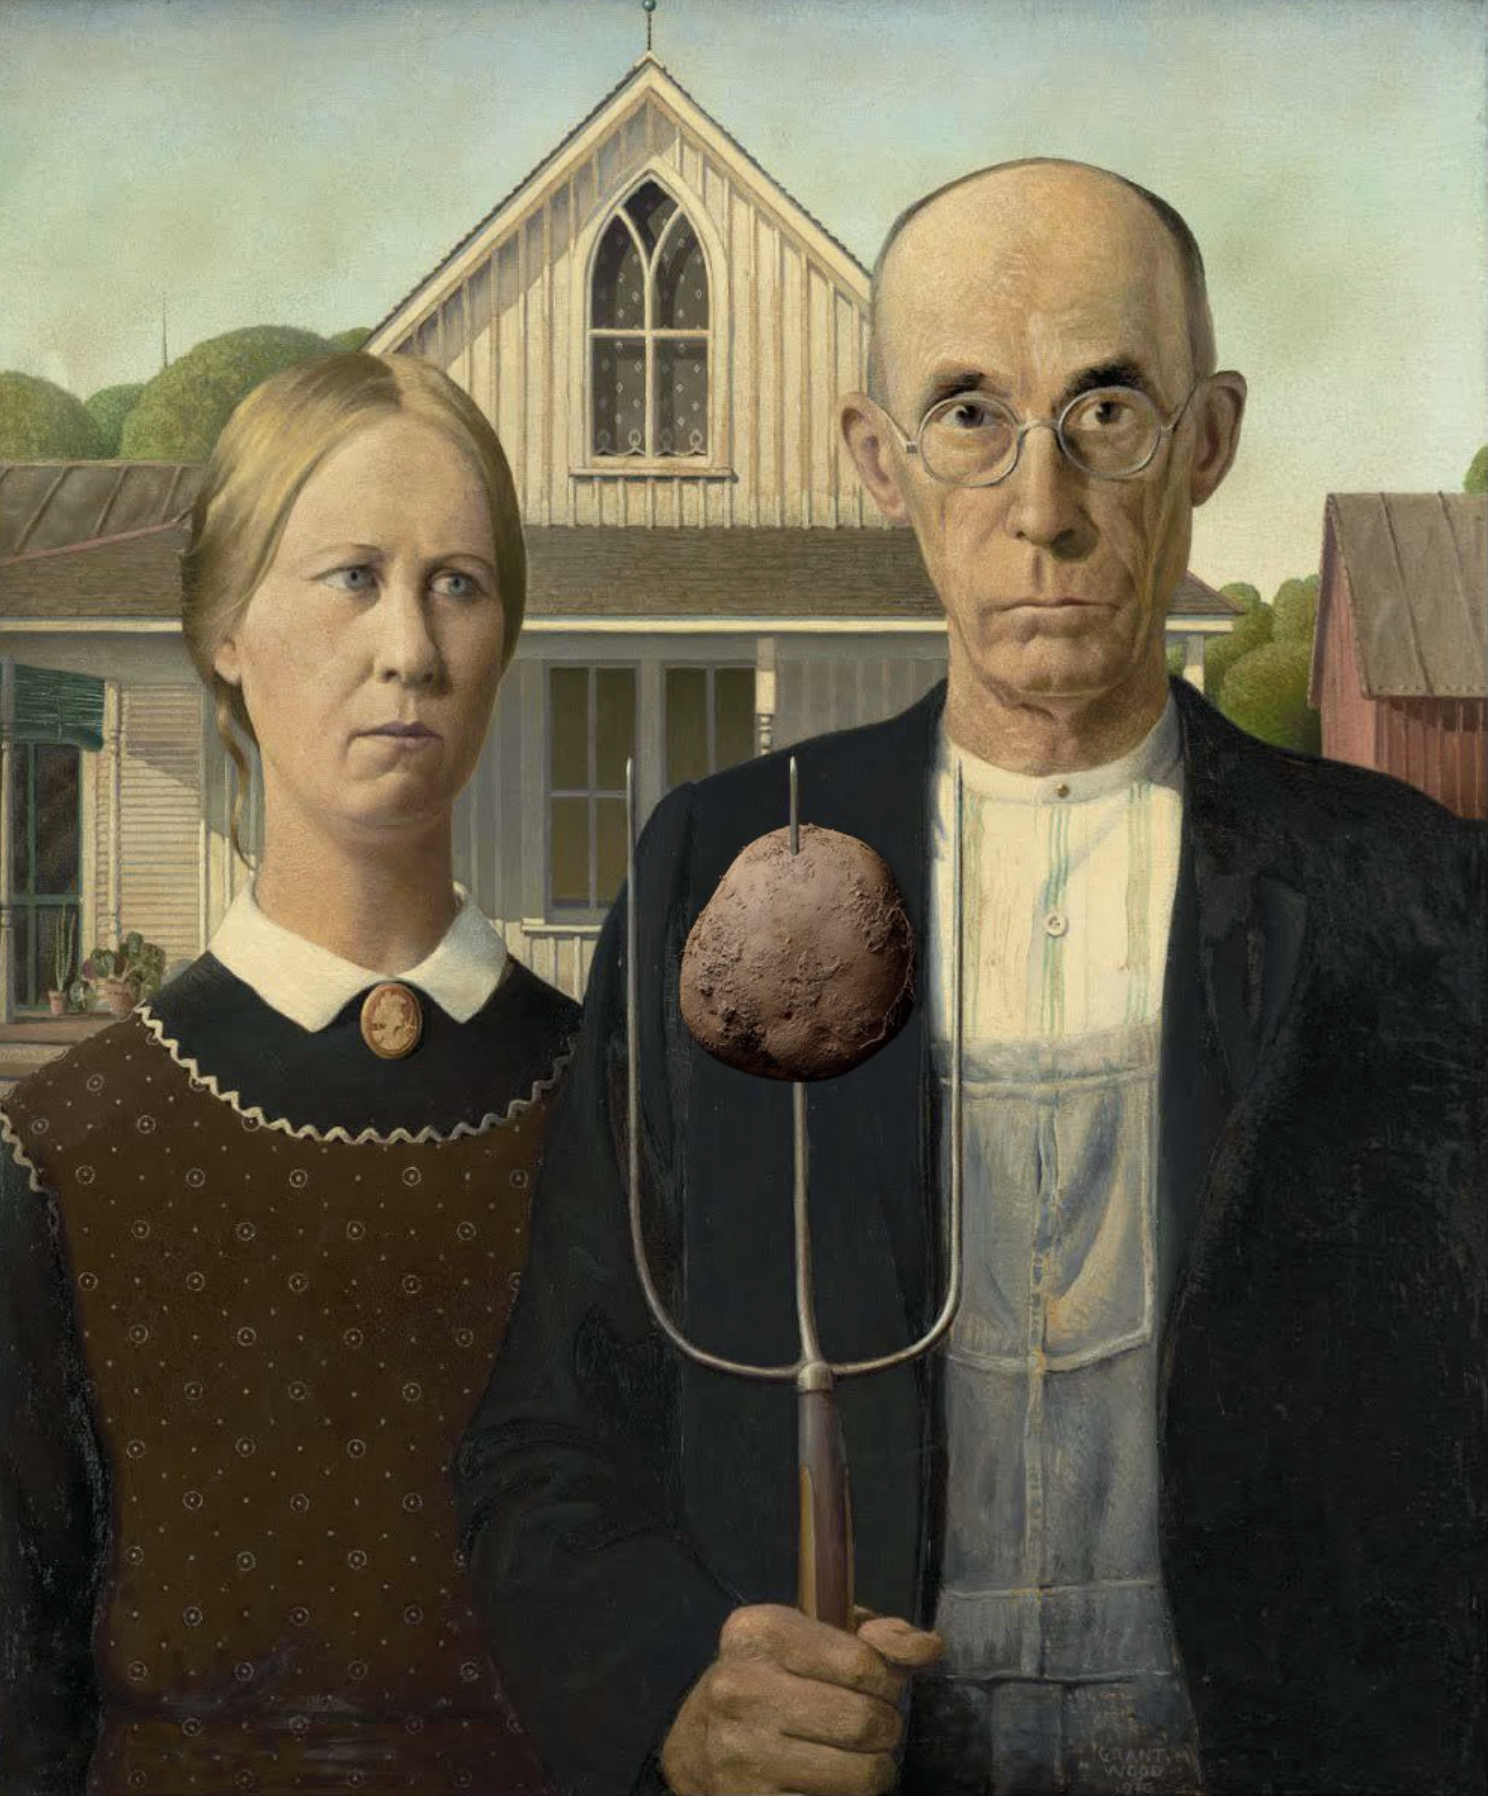 American Gothic with Potato (via @NycAnarchy)